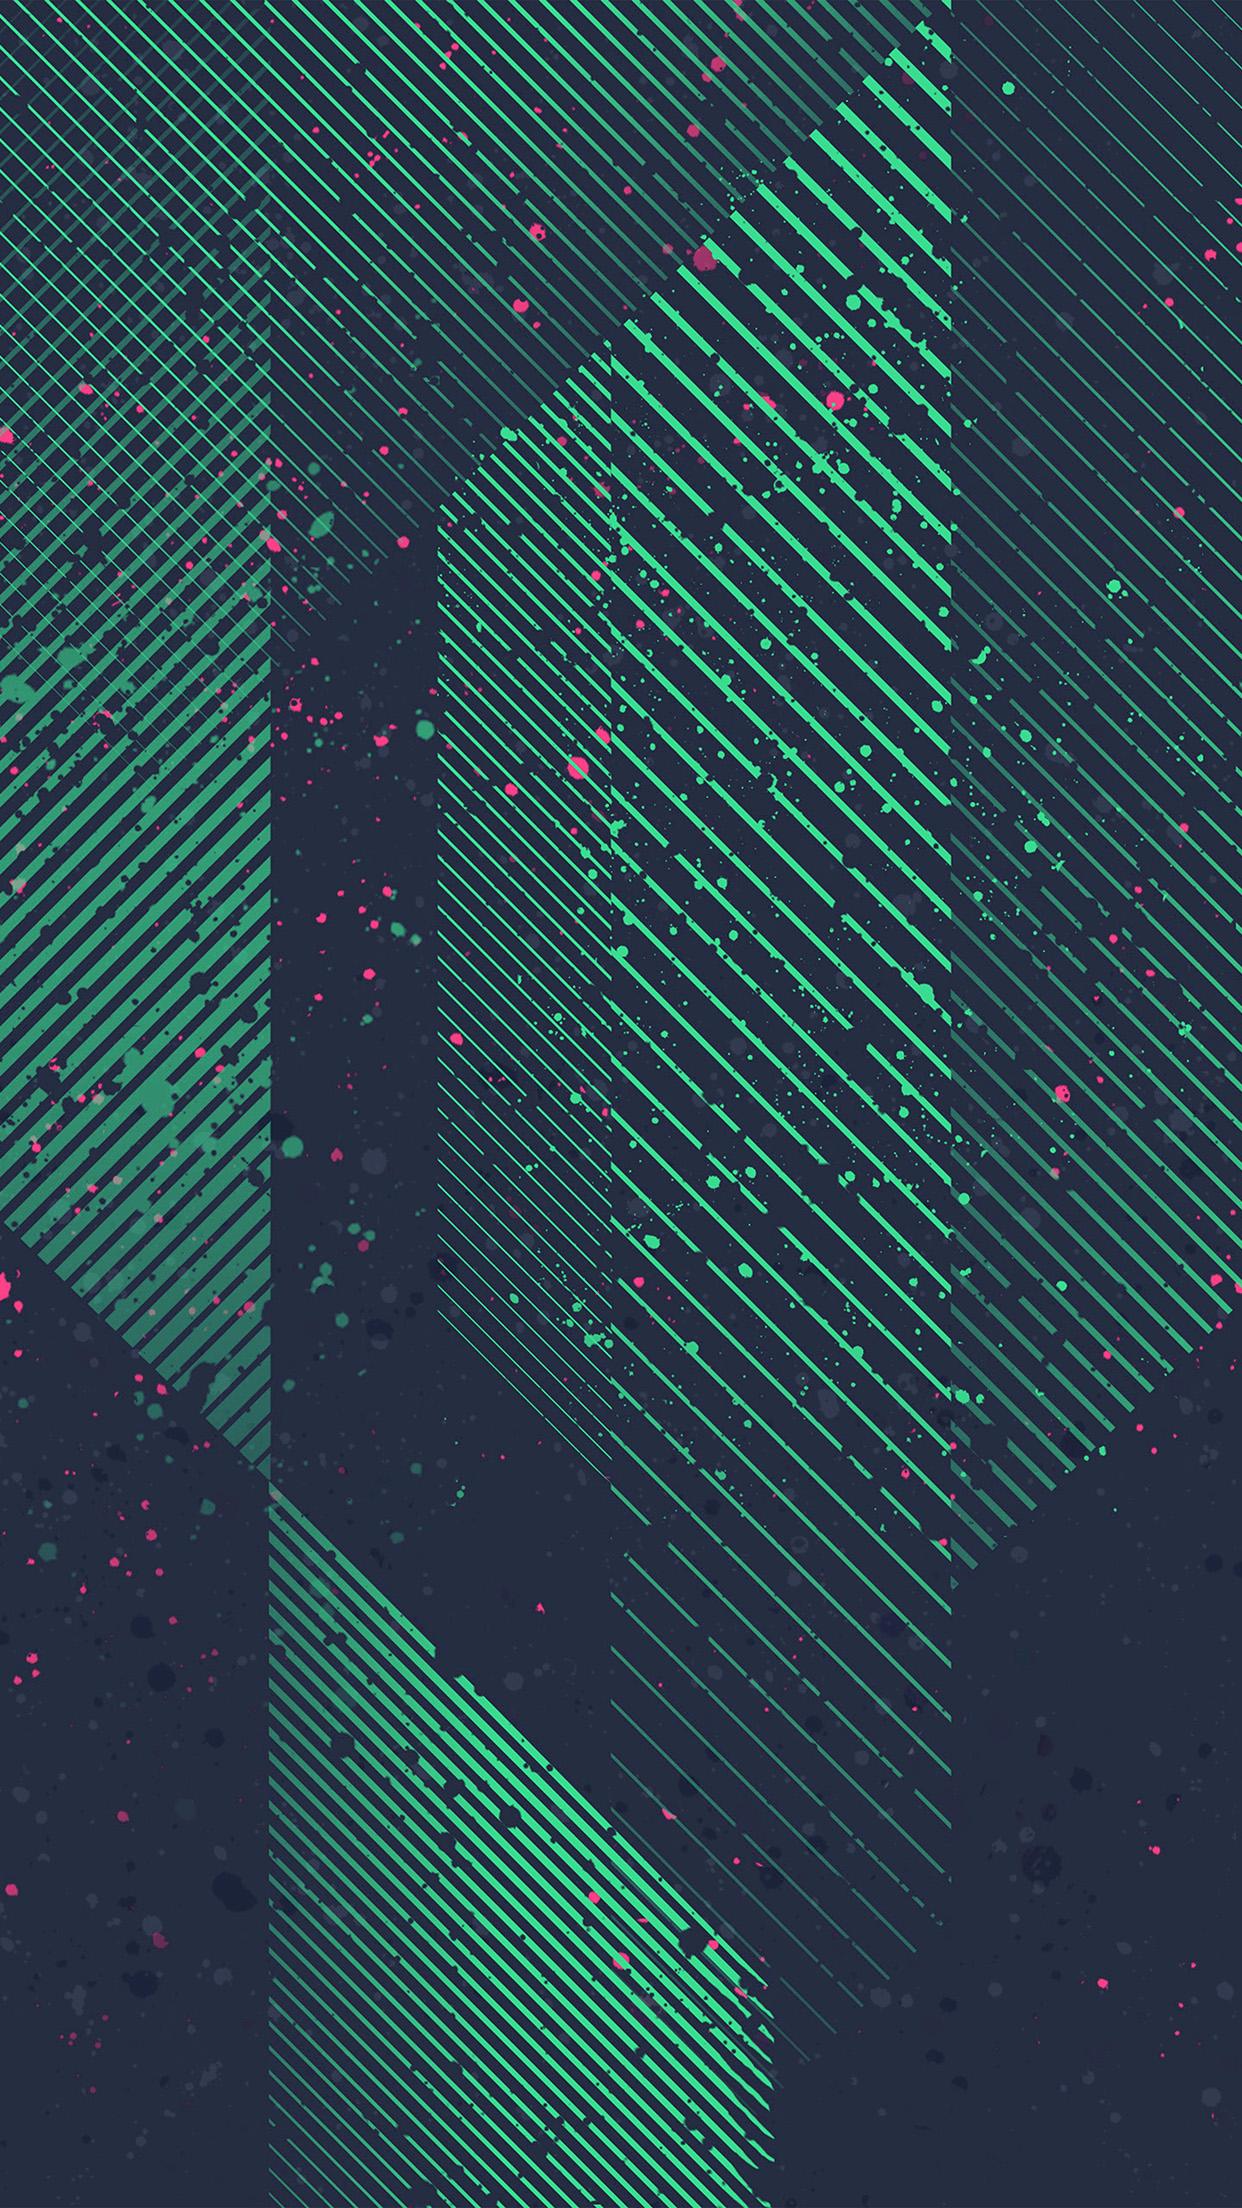 Fall Desktop Wallpaper Papers Co Iphone Wallpaper Vs18 Htc Art Design Dot